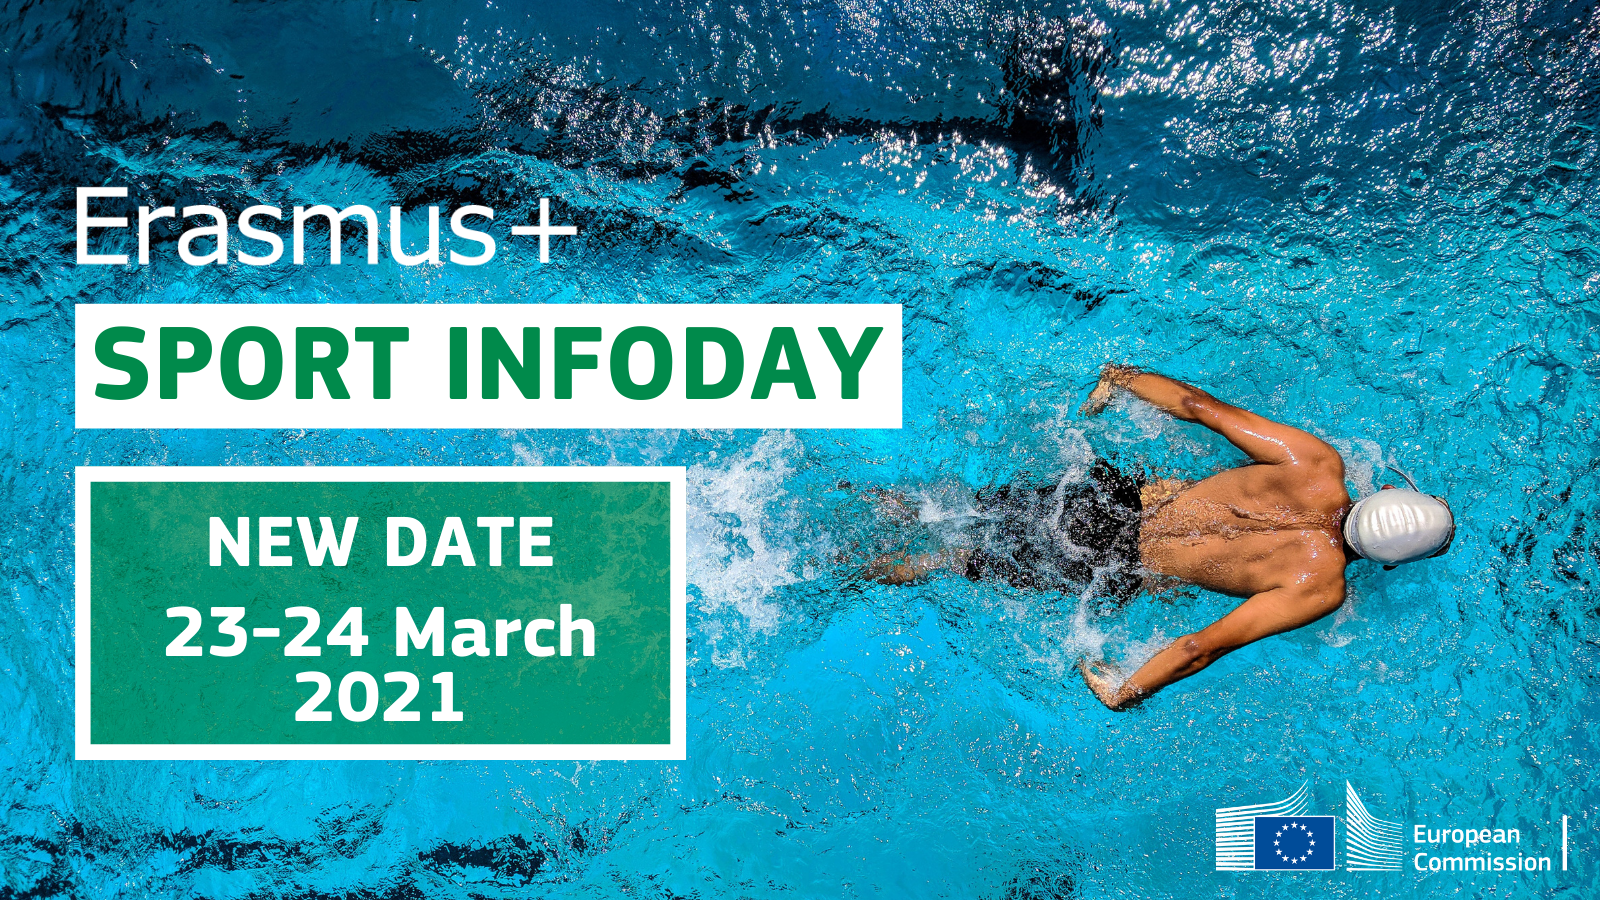 Online ERASMUS+ Sport Infoday